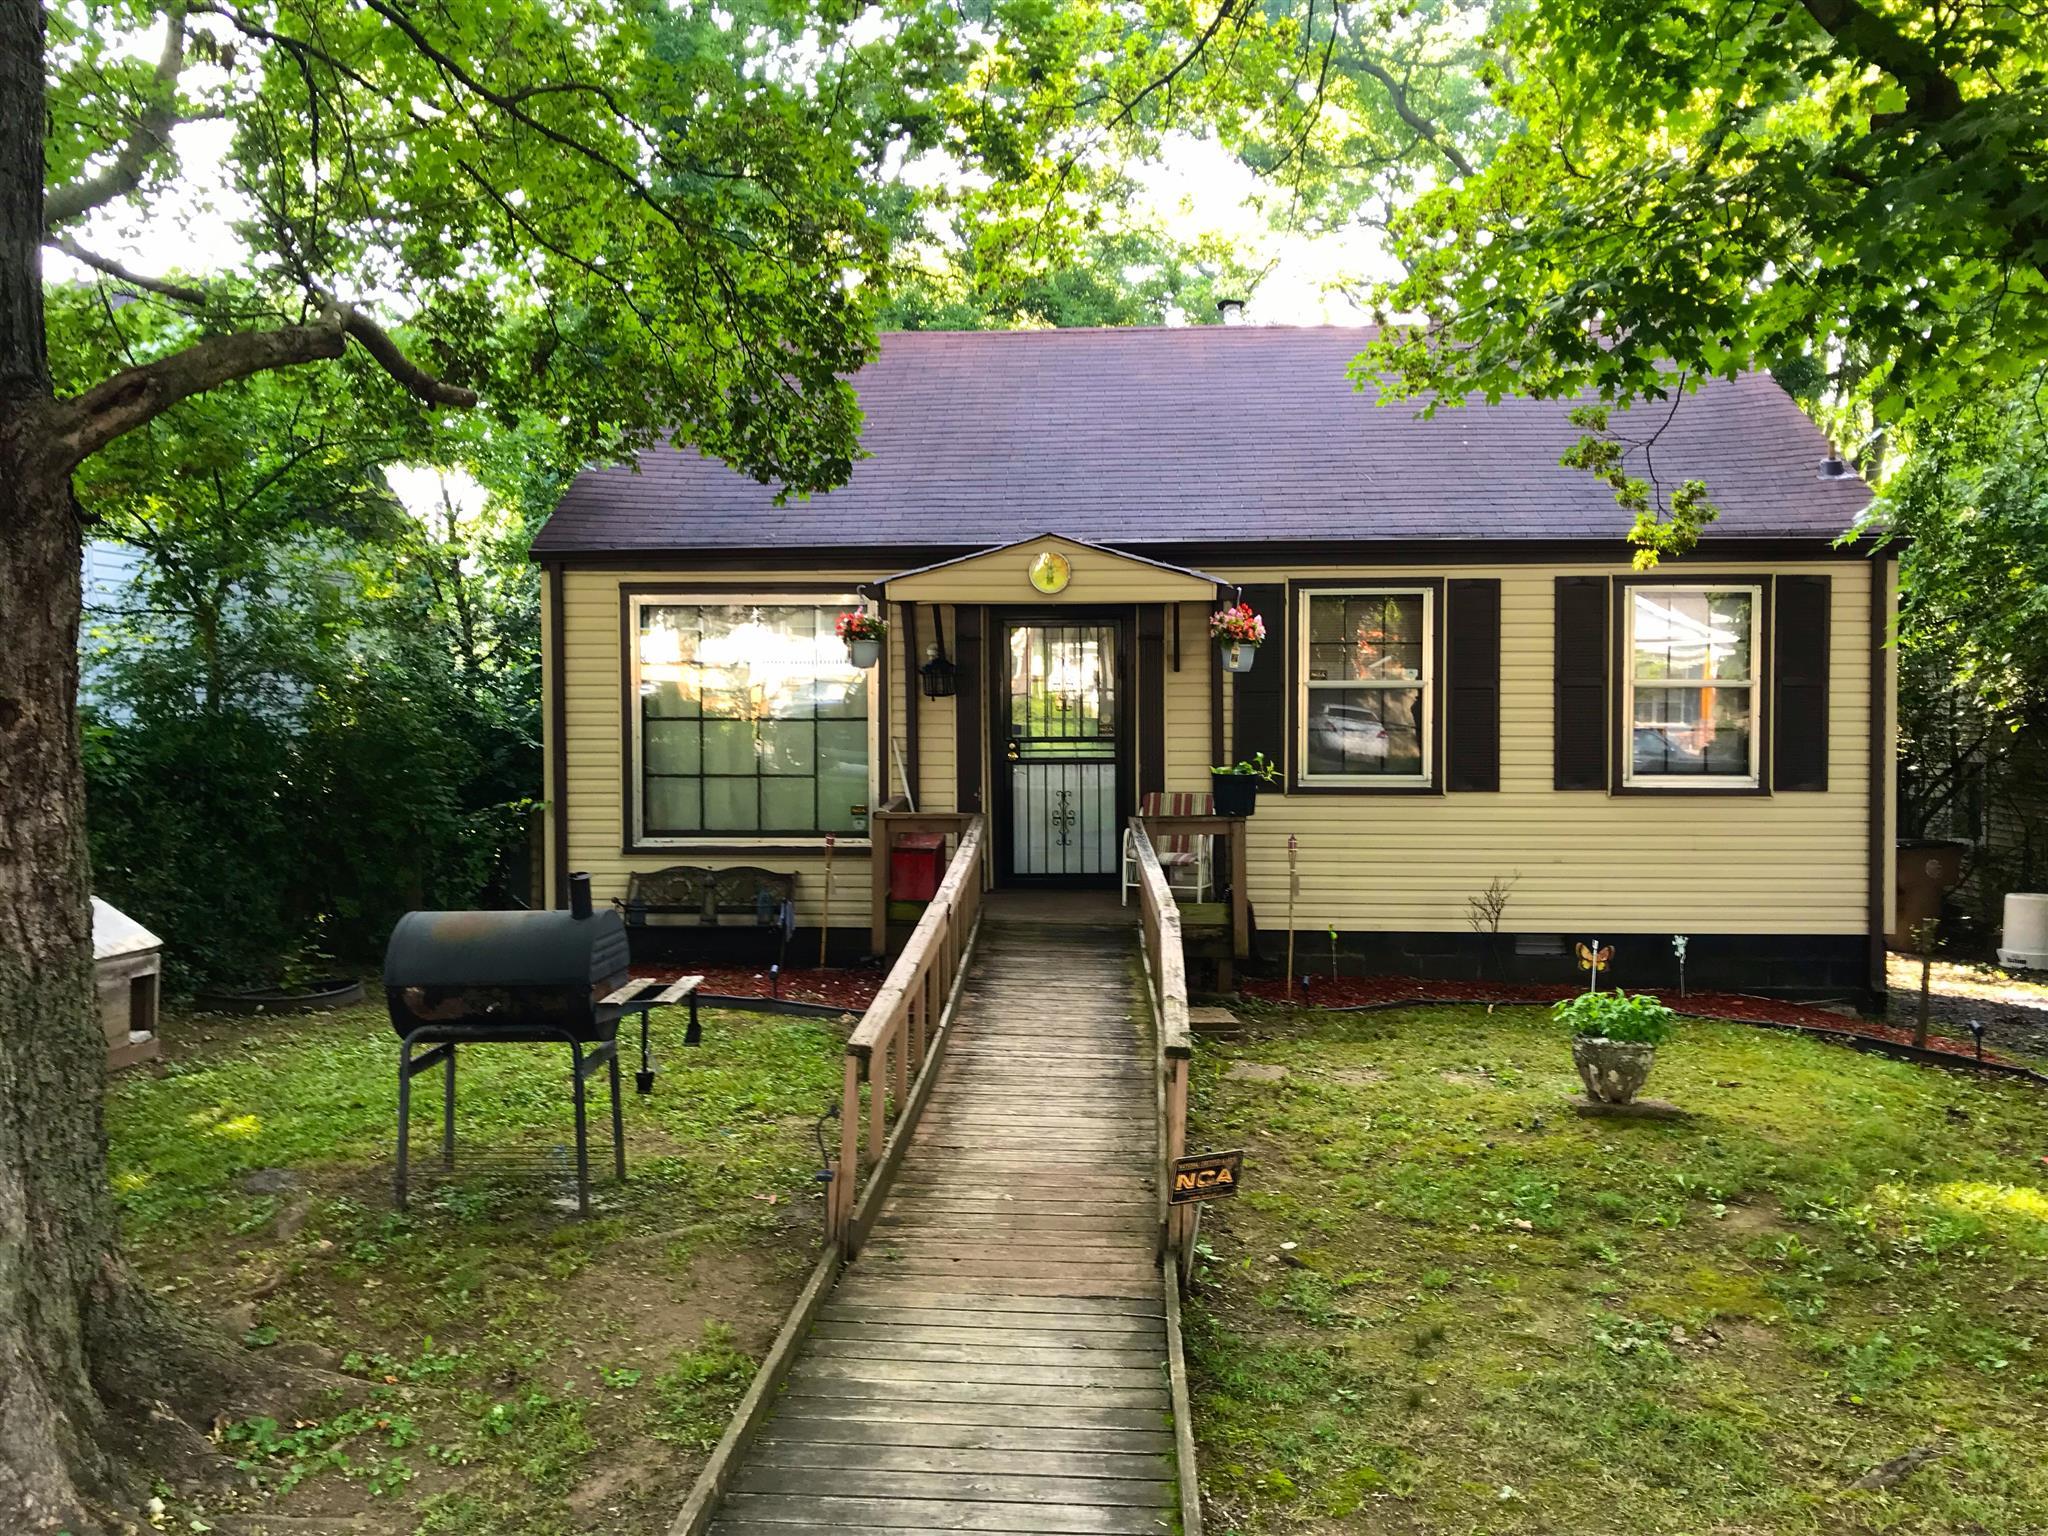 1209 Stockell St, Nashville, TN 37207 - Nashville, TN real estate listing